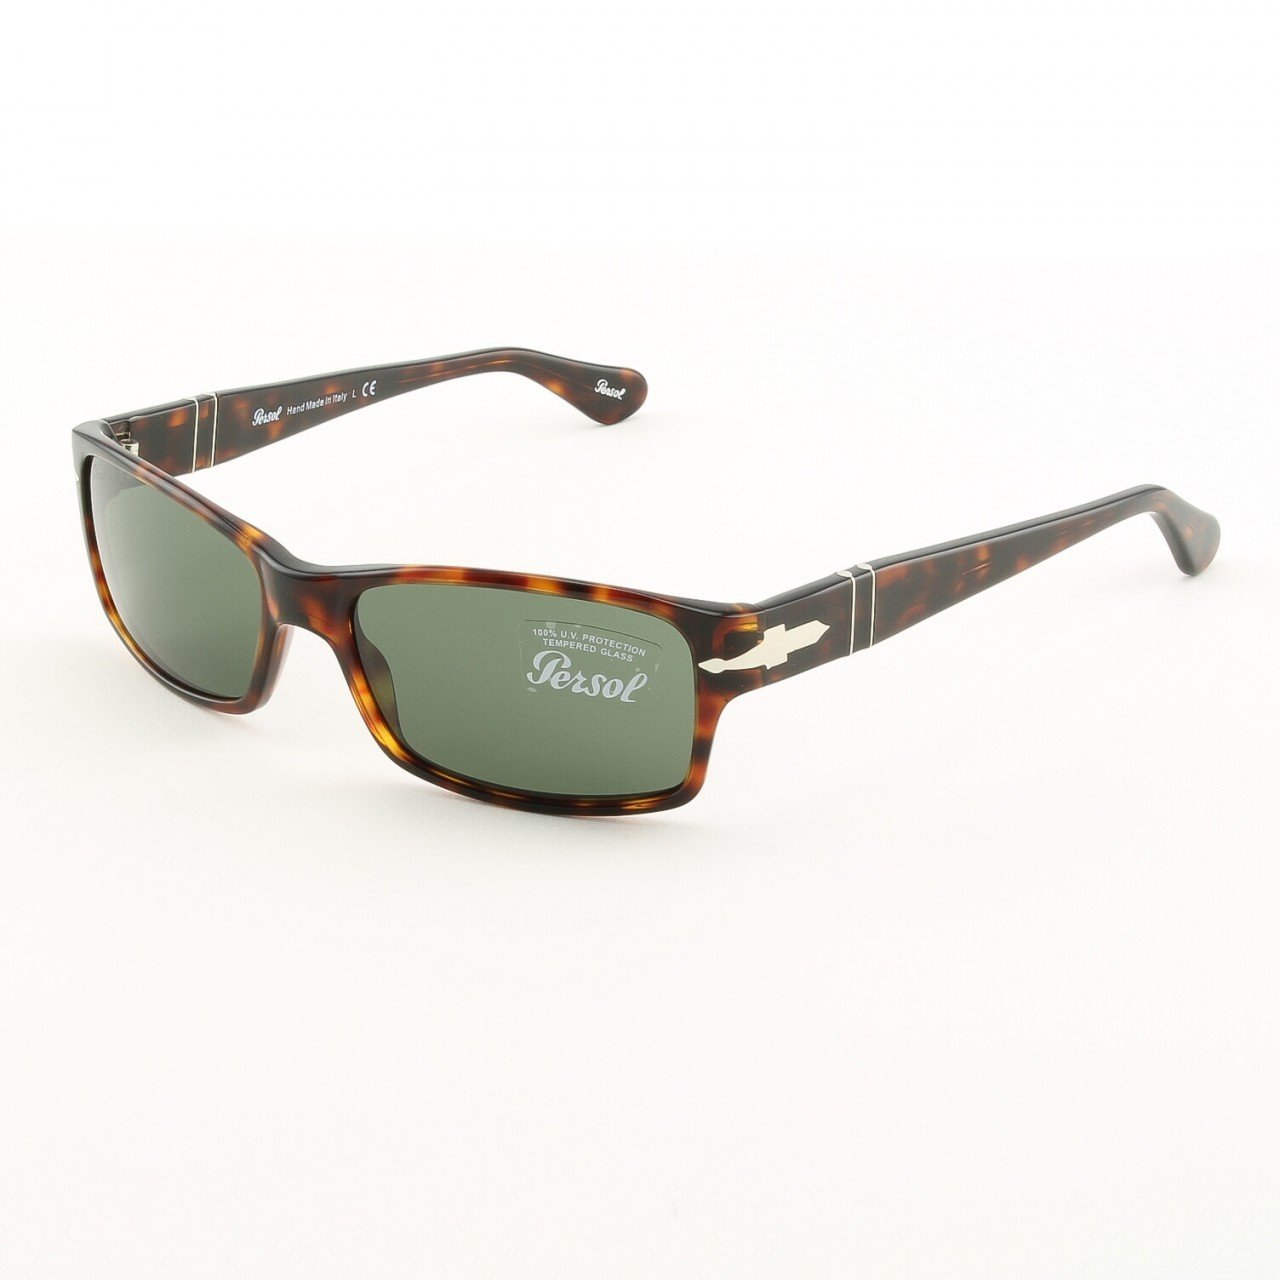 Persol PO2803S 24/31 55mm Havana Sunglasses with Grey Lenses